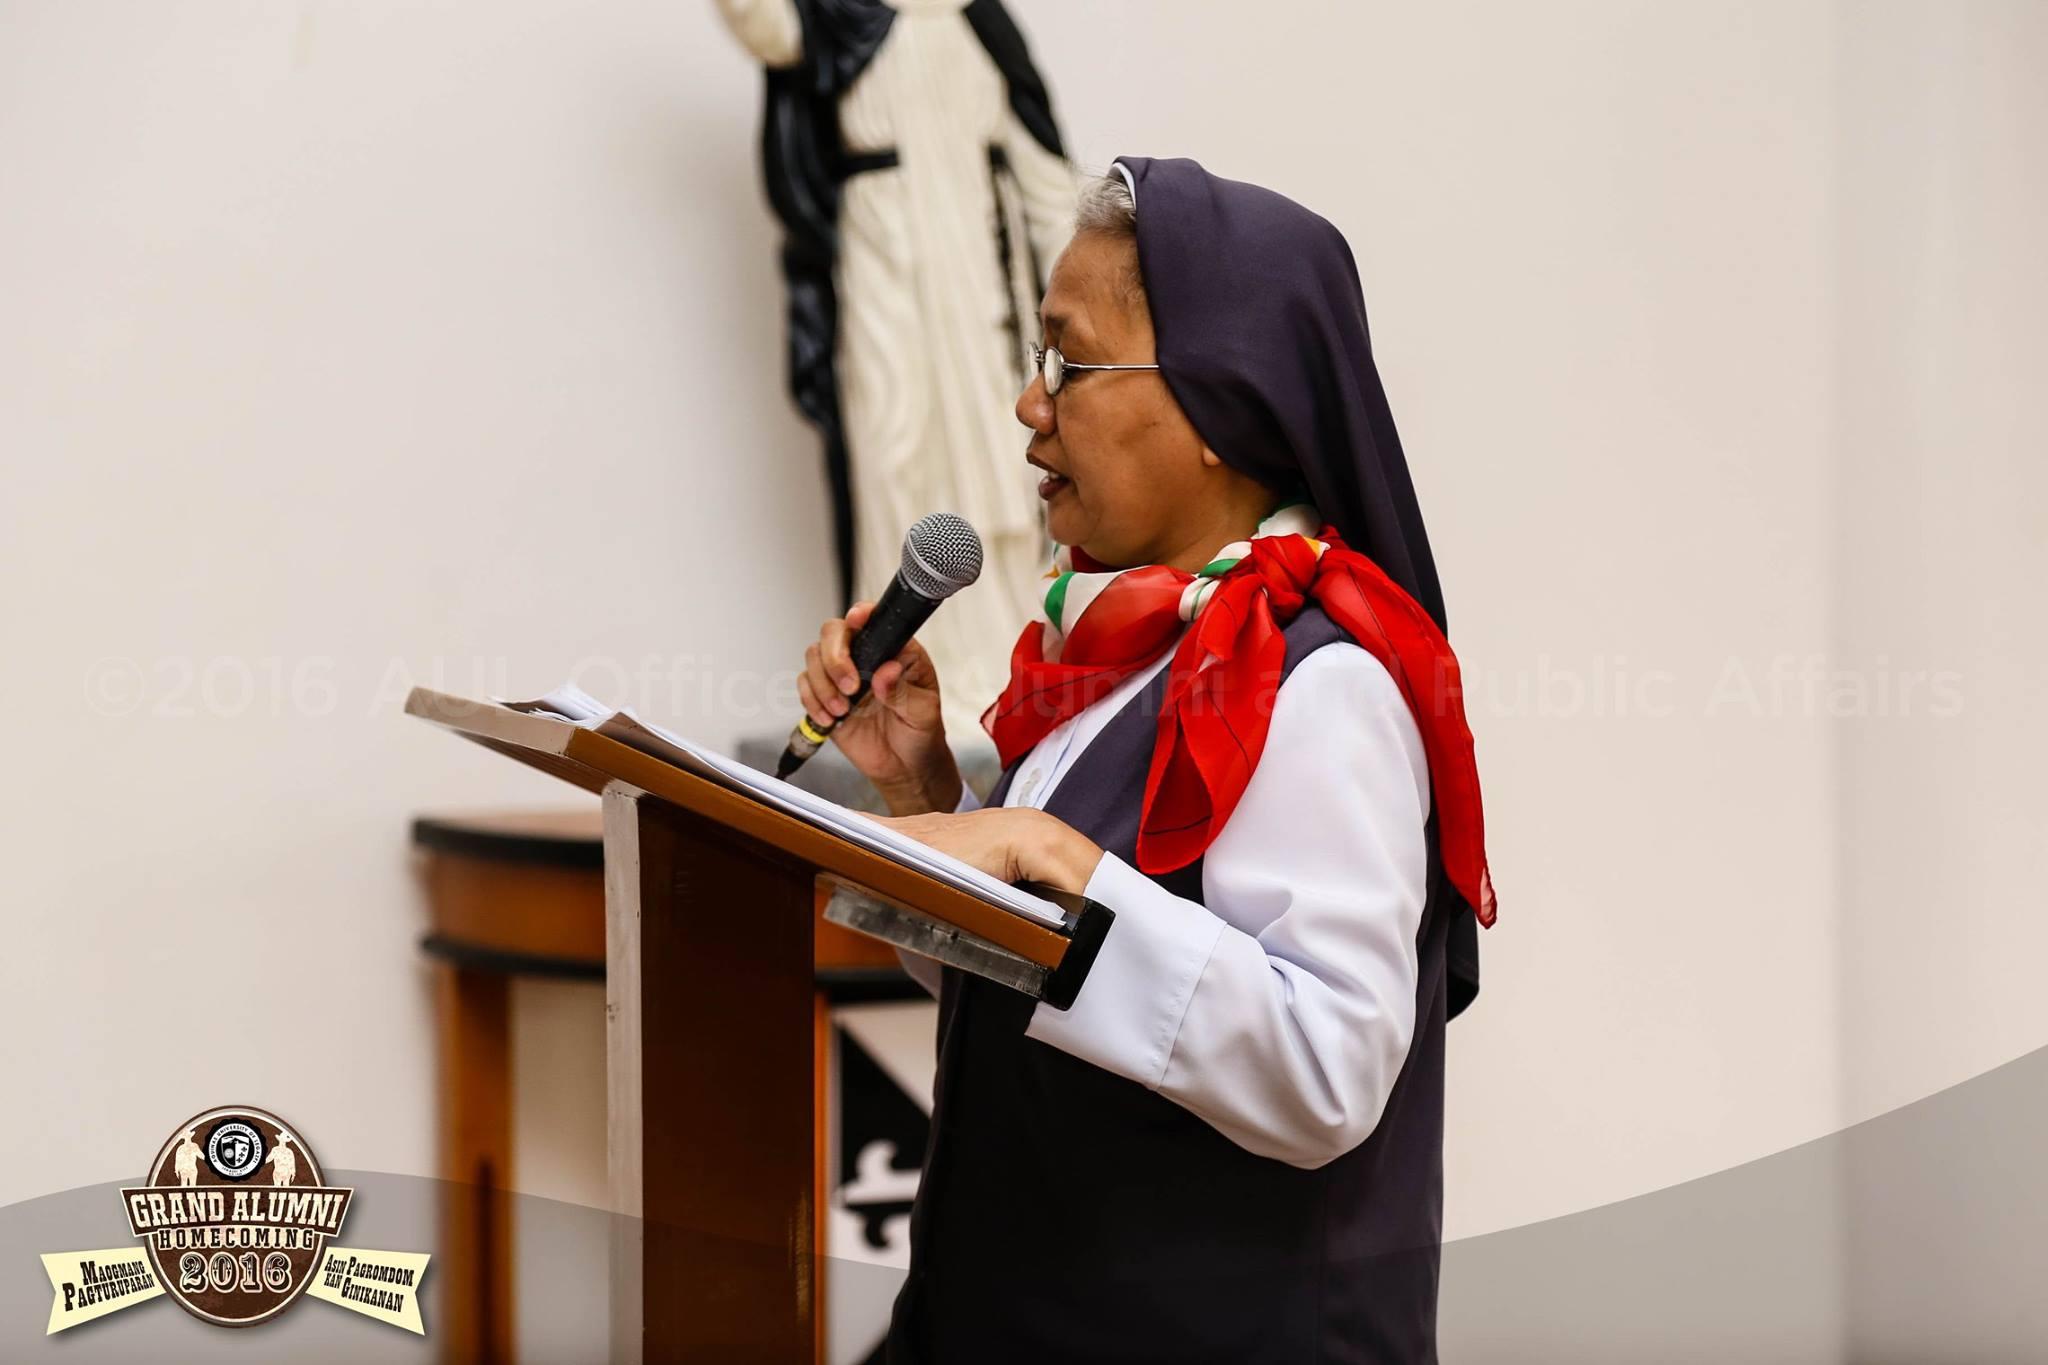 Grand Alumni Homecoming – Eucharistic Celebration